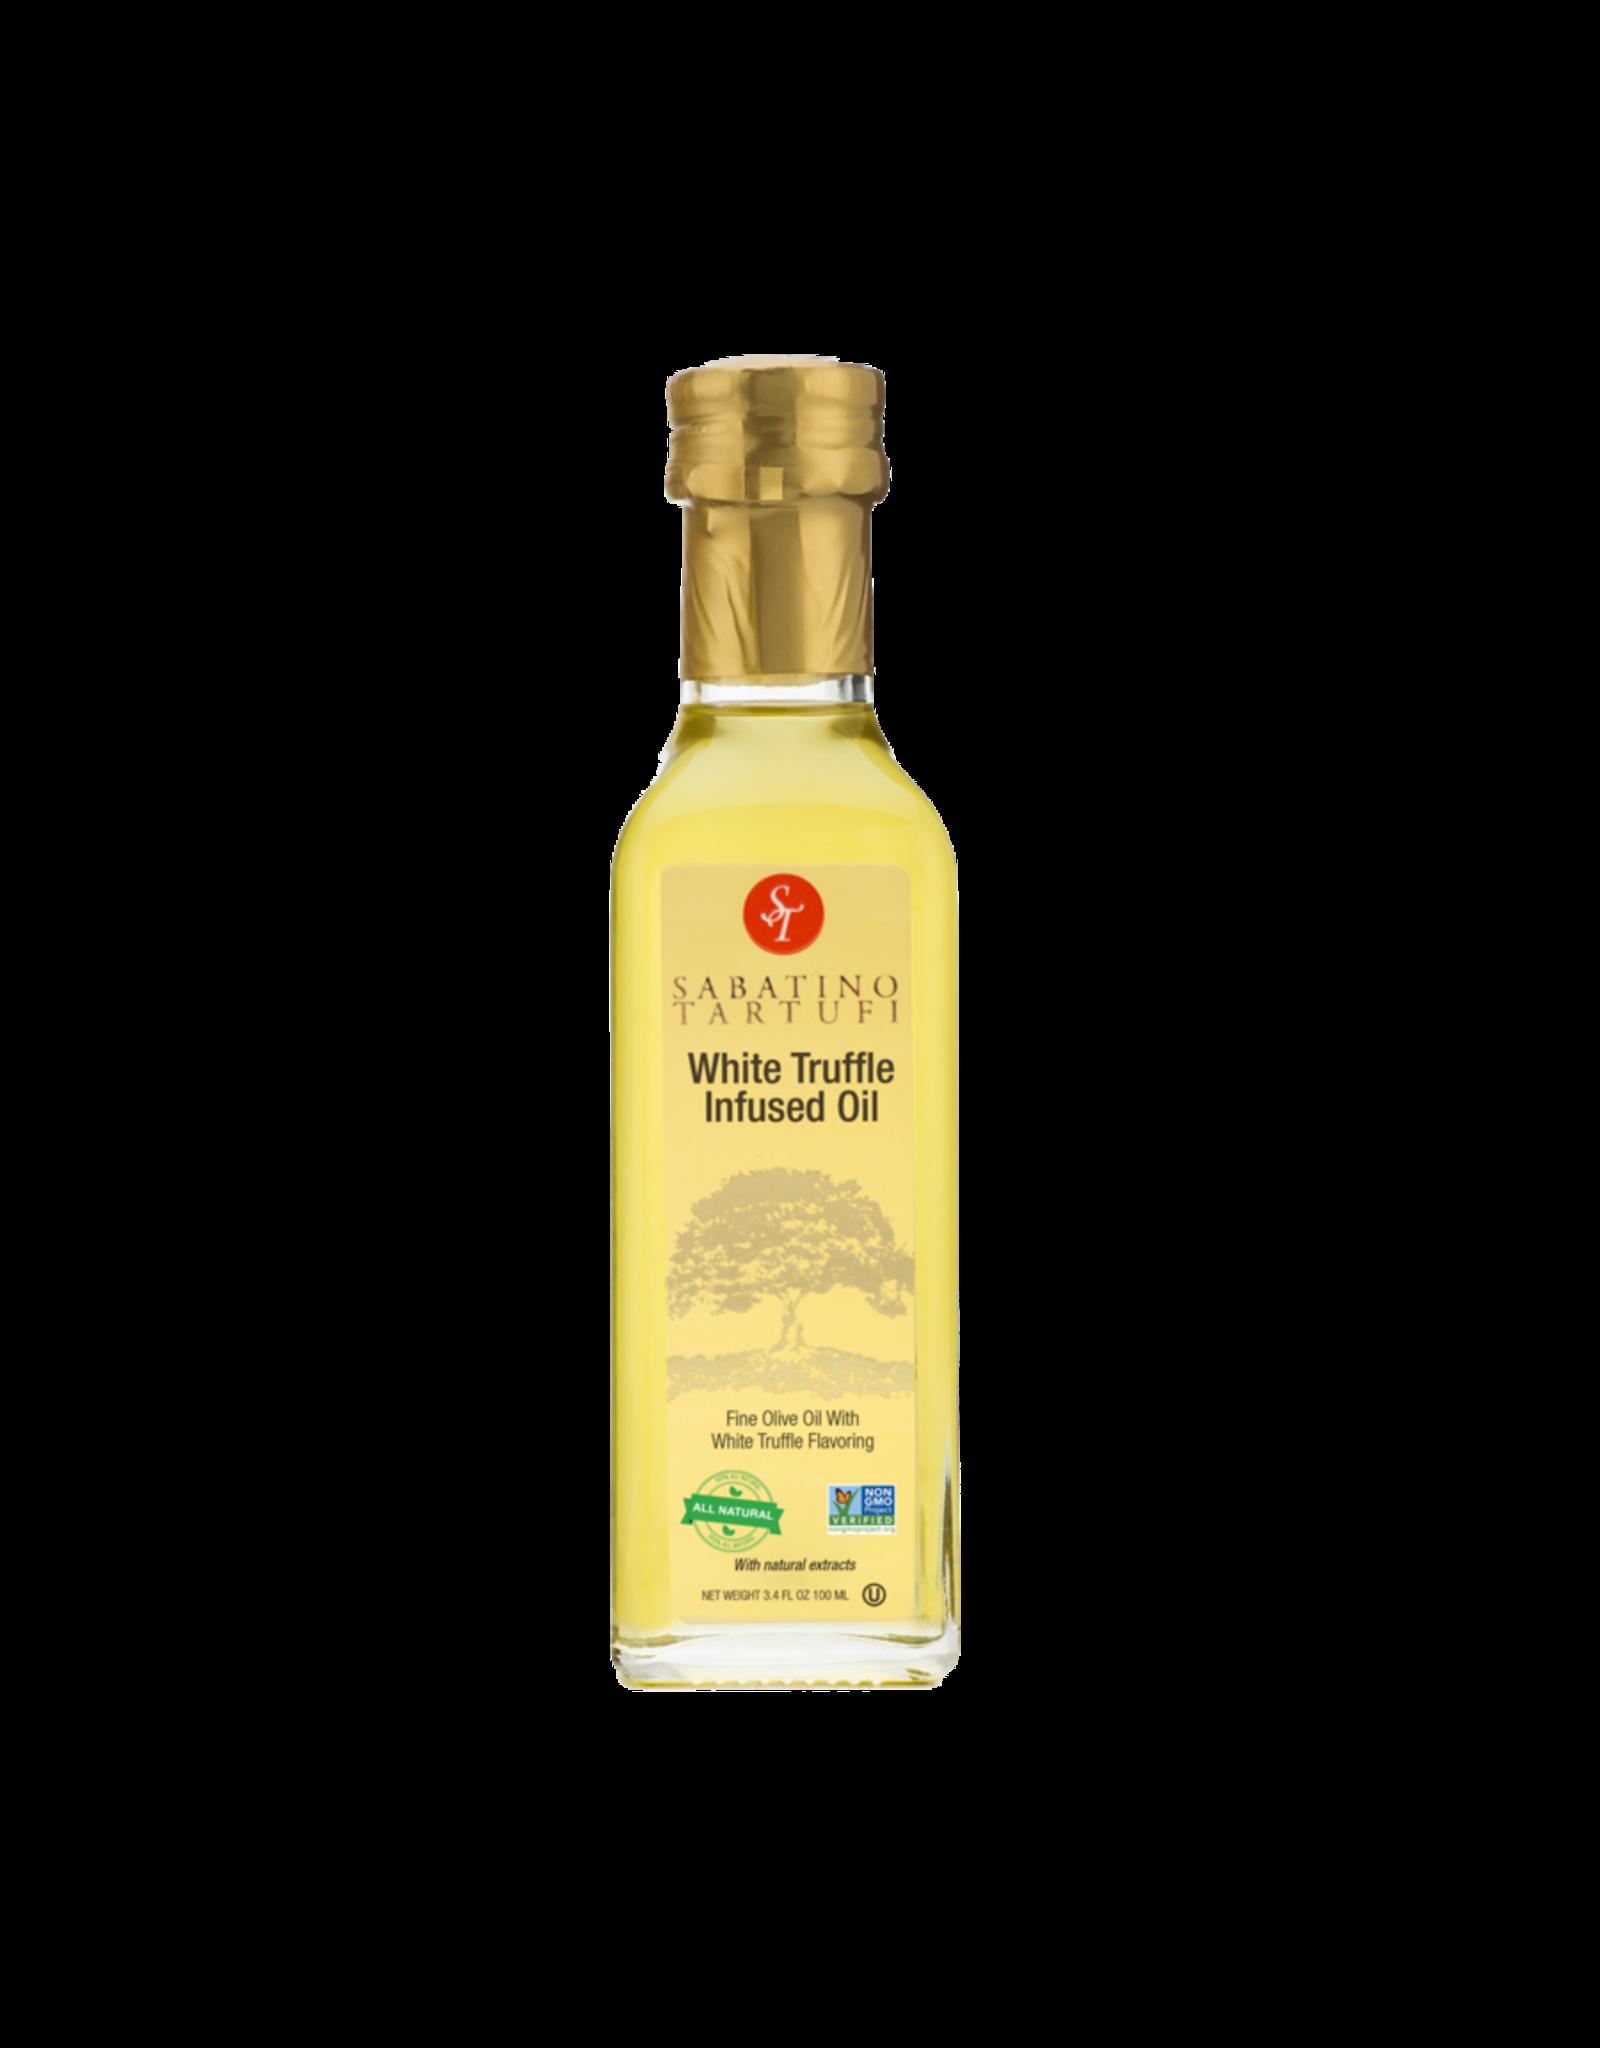 Sabatino Tartufi Sabatino Tartufi White Truffle Olive Oil